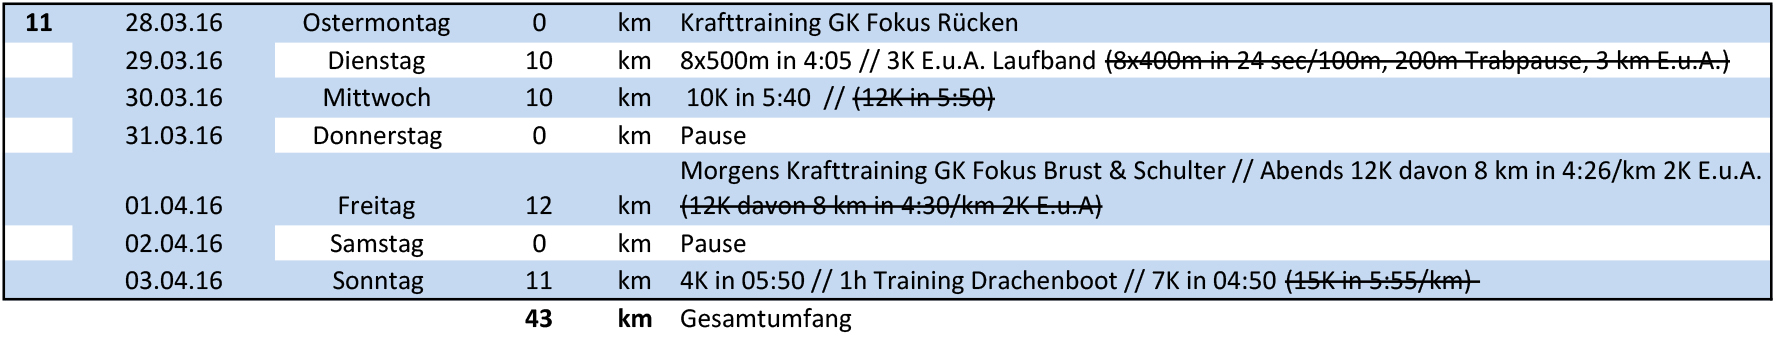 Trainingsplan 2016